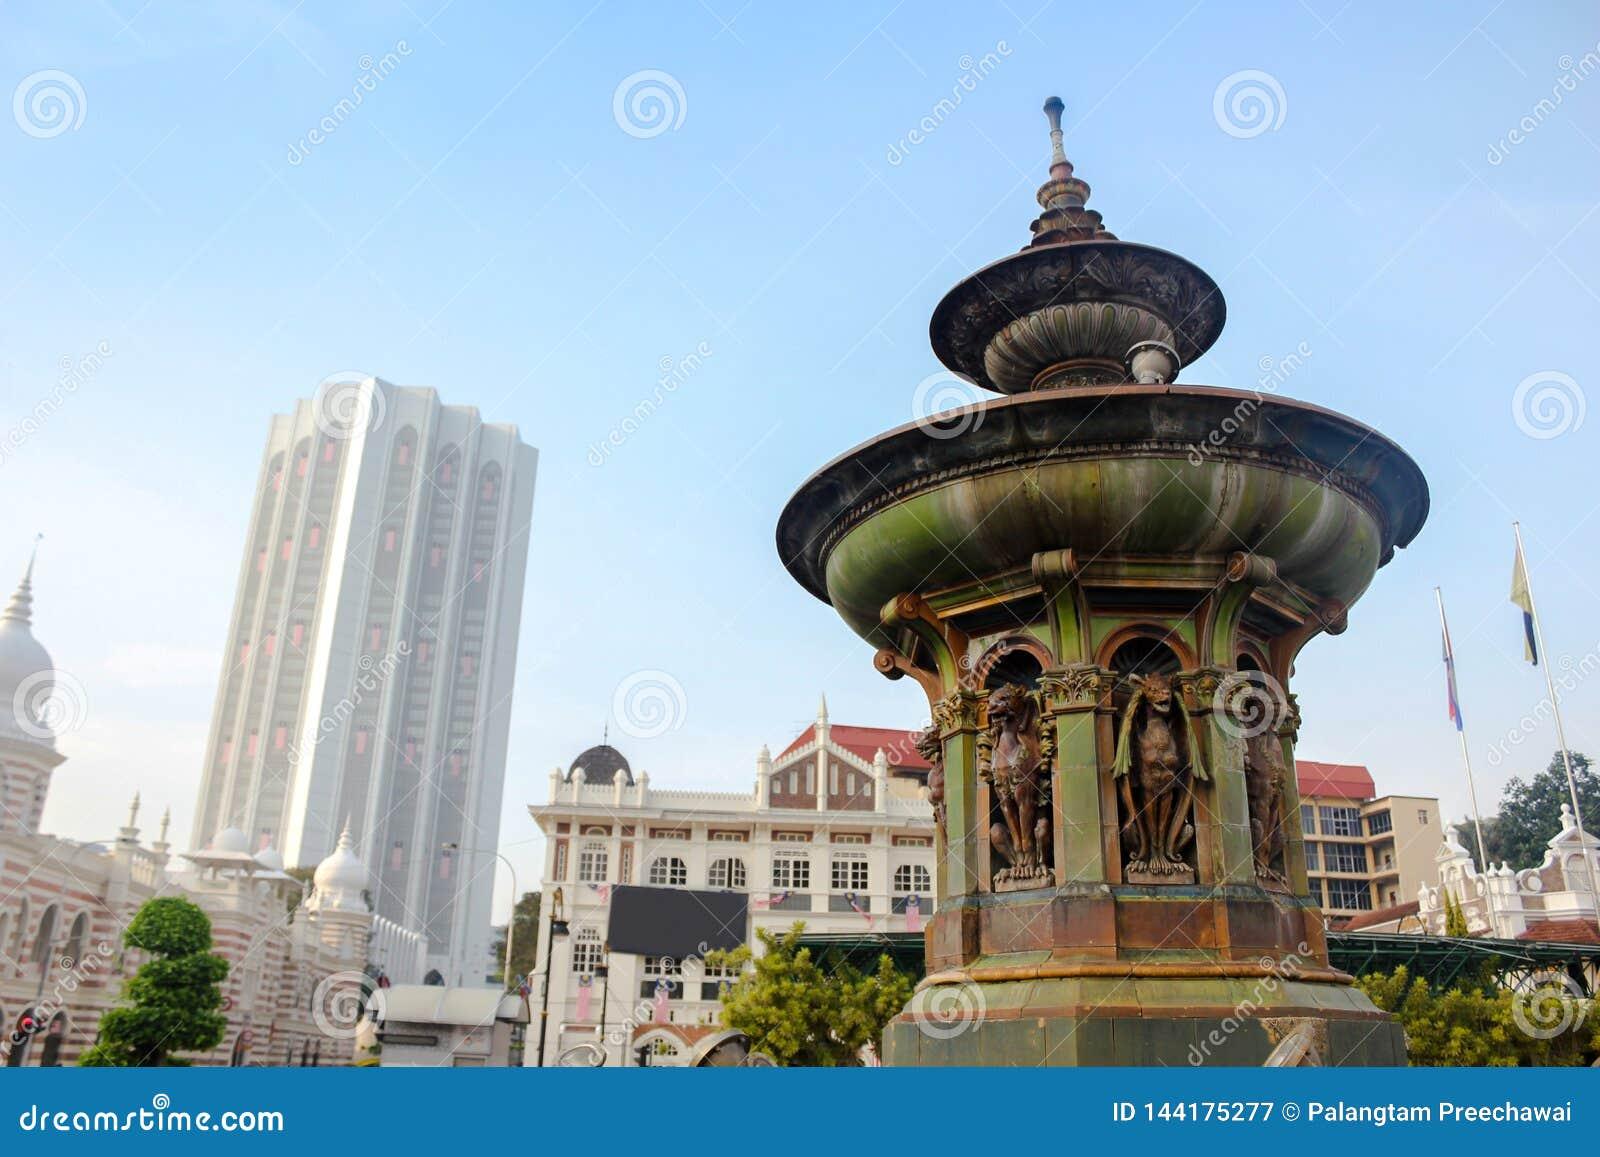 Queen Victoria Fountain At Merdeka Square, Kuala Lumper